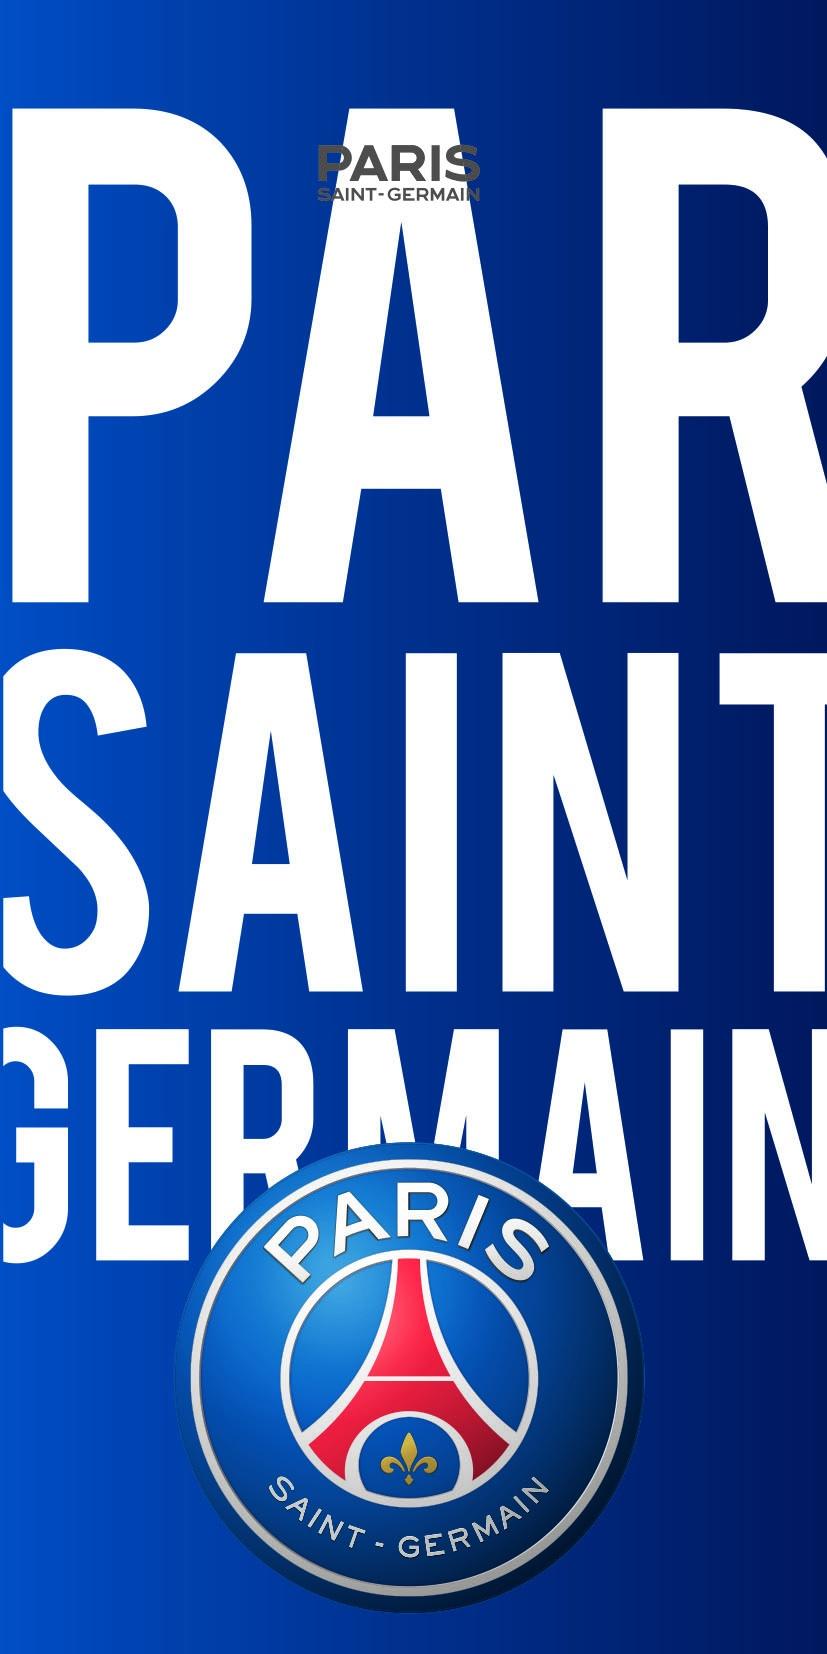 Paris Saint-Germain Logo Background